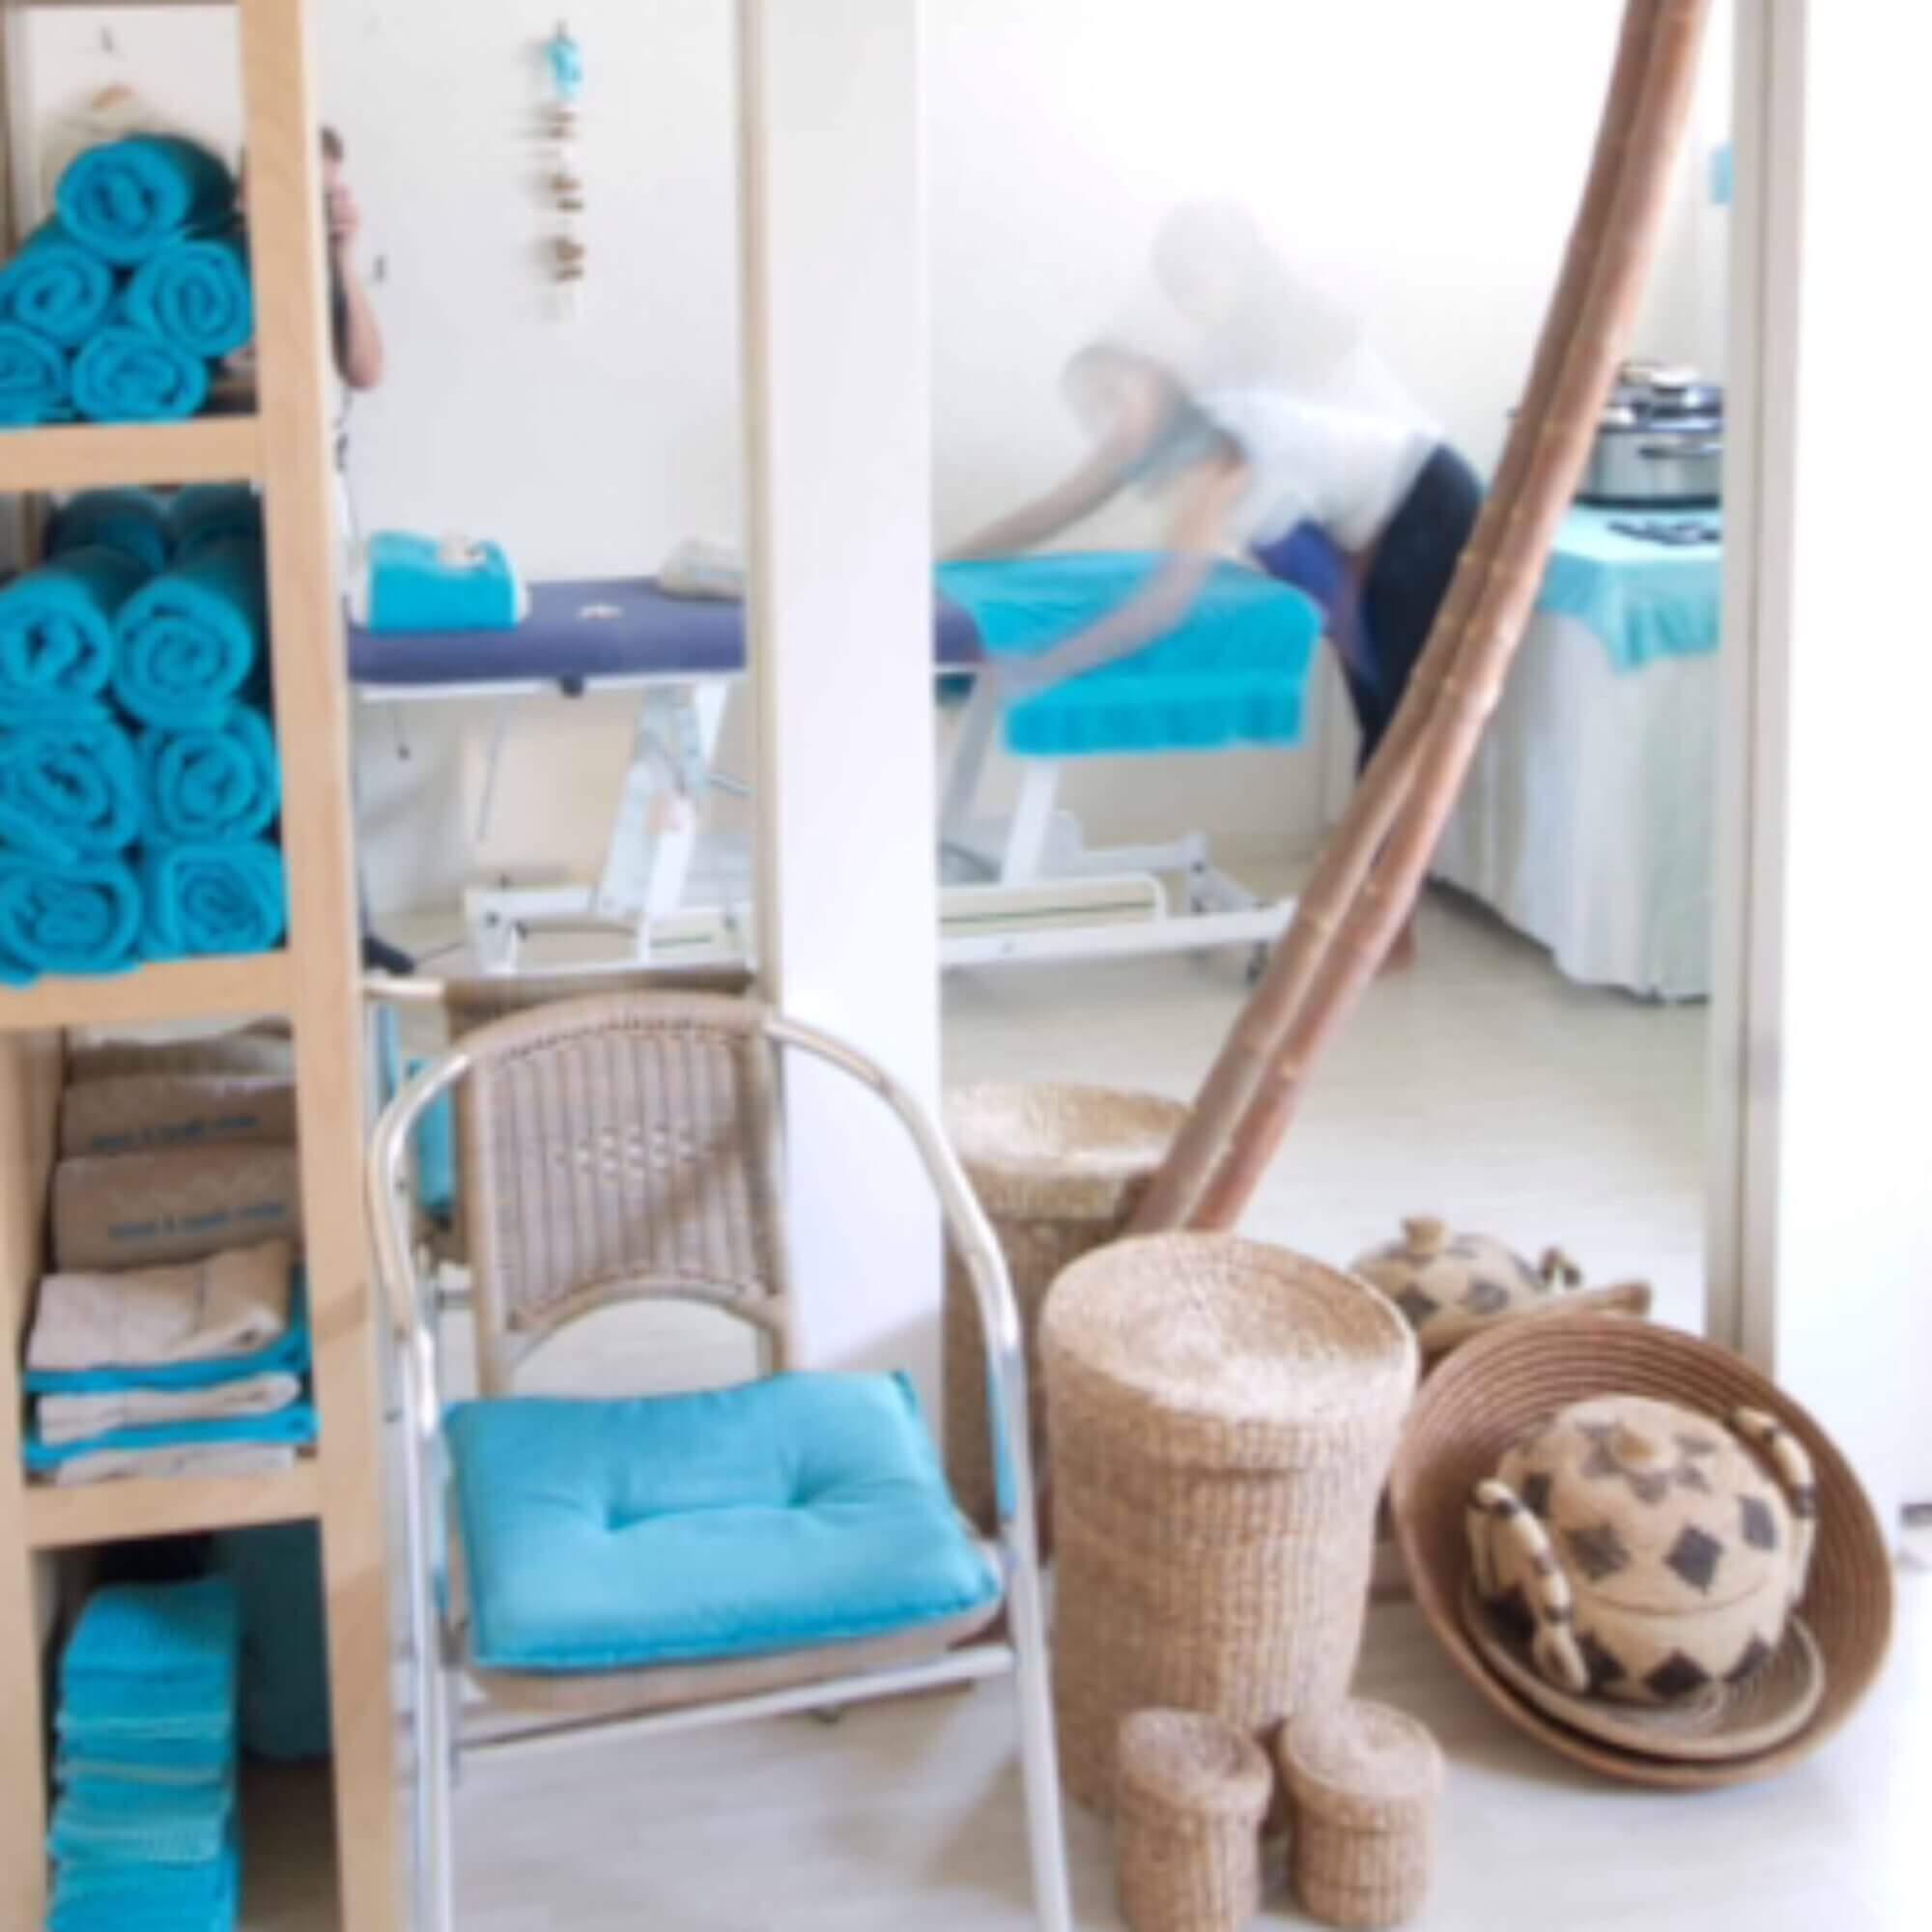 waves medical massage oefentherapie Waves, beach & health center Zandvoort Cathy Samé Lottin